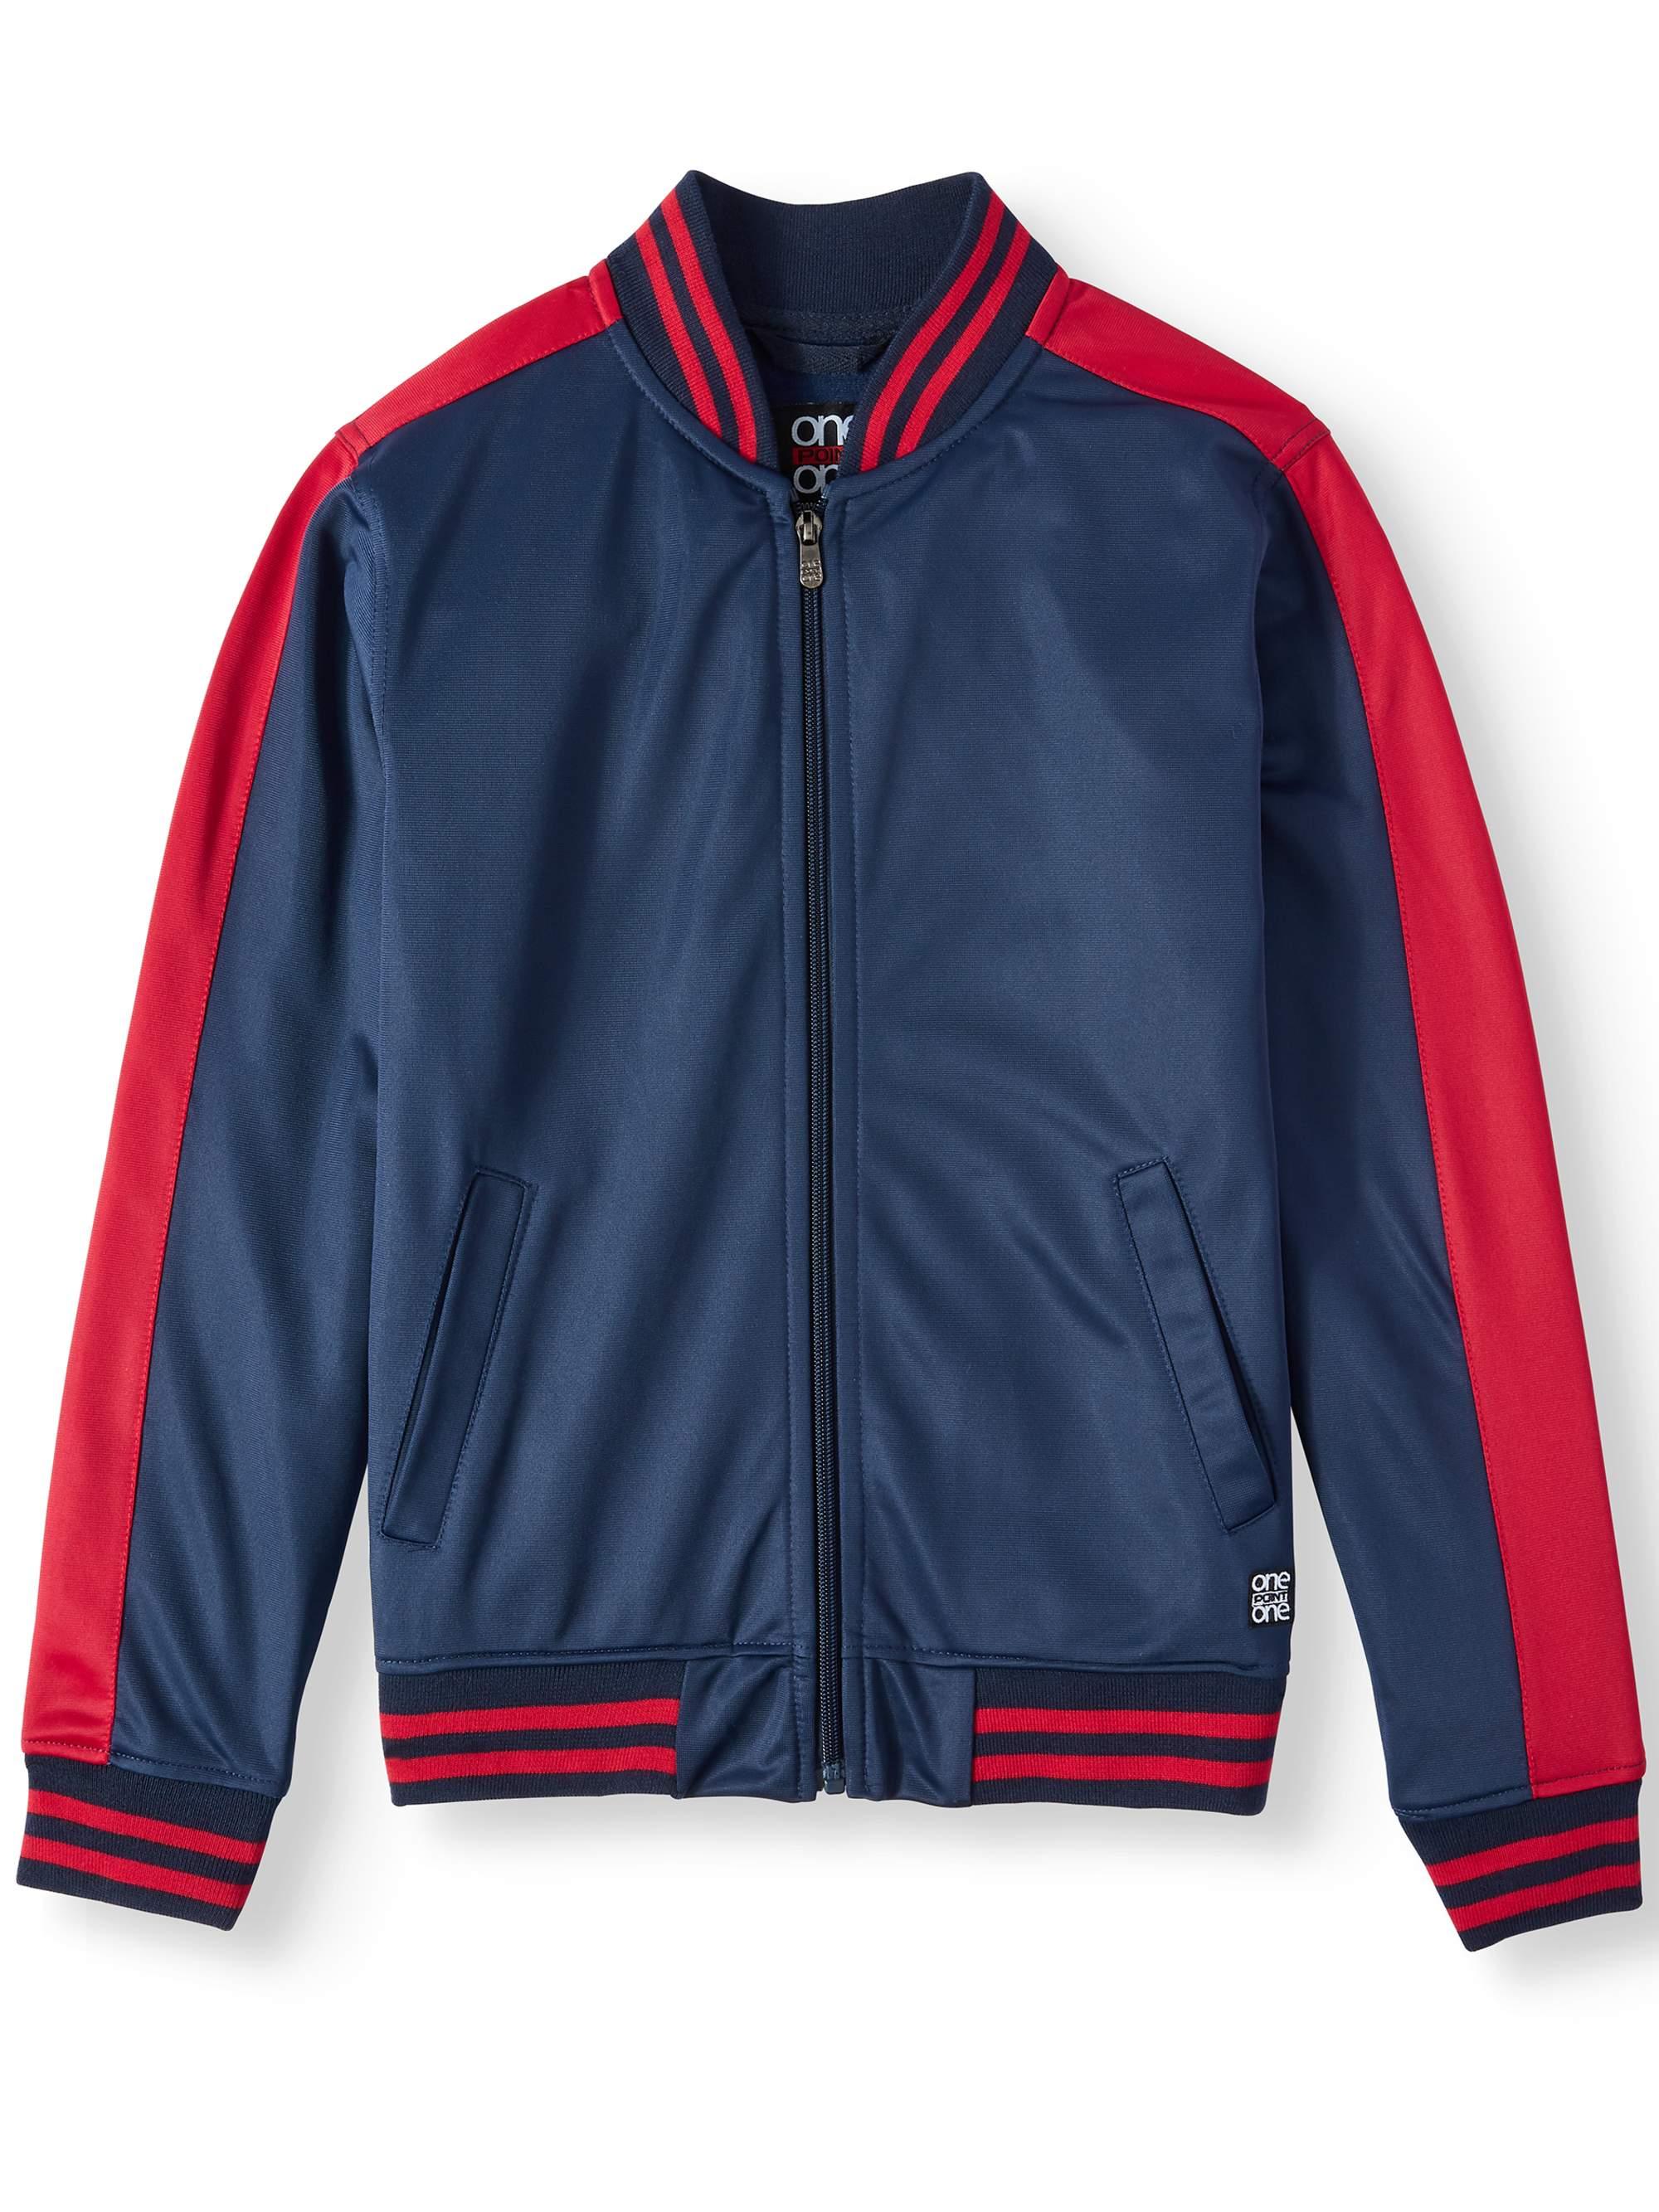 Tricot Performance Zip Up Jacket (Big Boys)